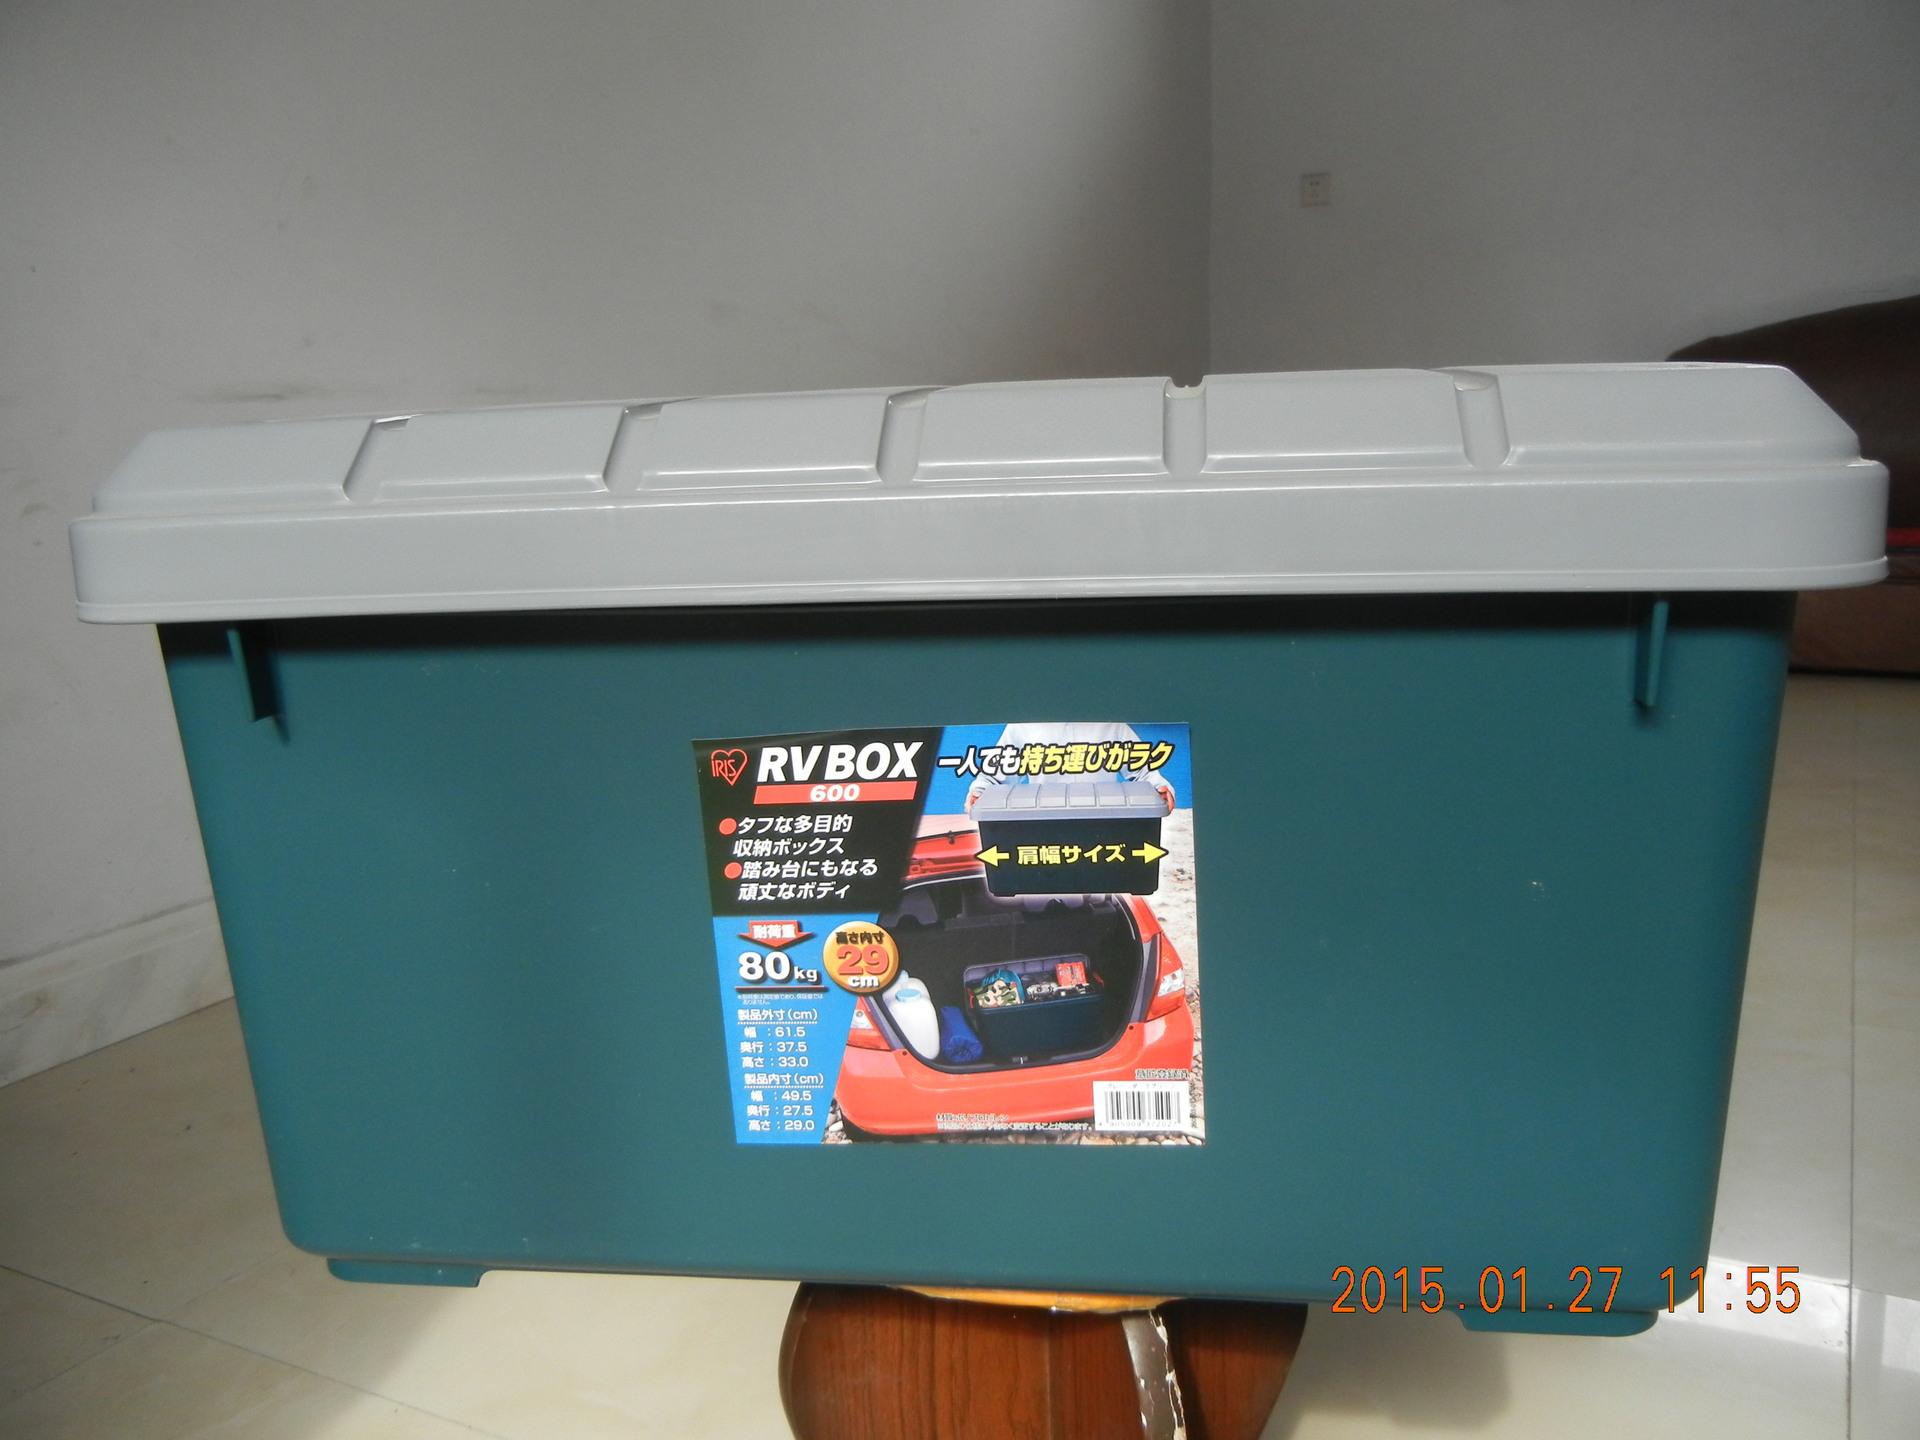 IRIS 爱丽思 车载收纳箱 RVBOX 600 灰绿 储物 整理 置物箱图片